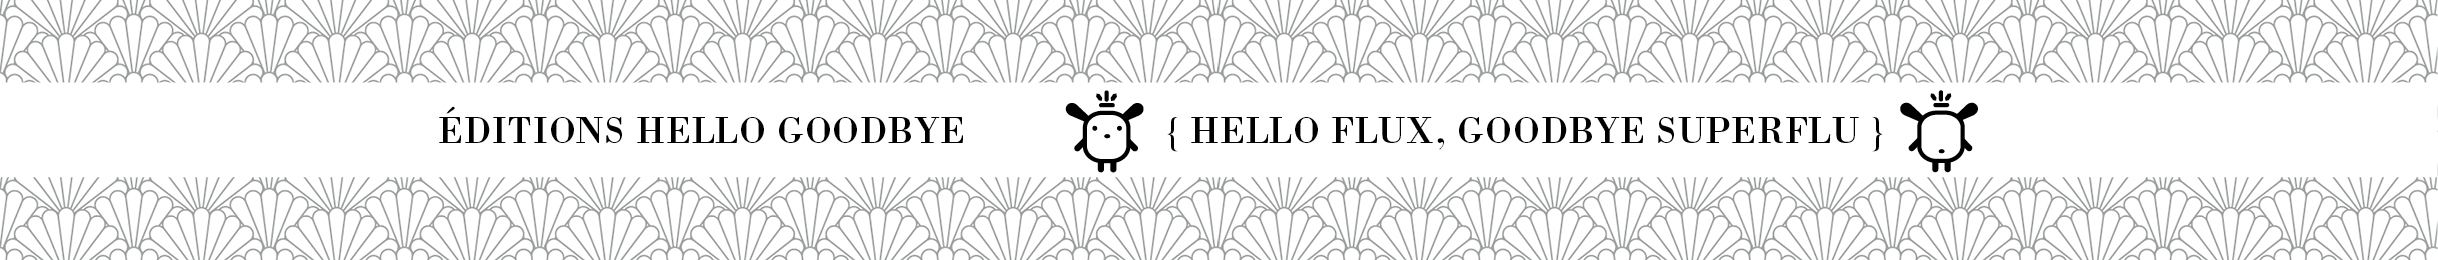 Editions Hello Goodbye